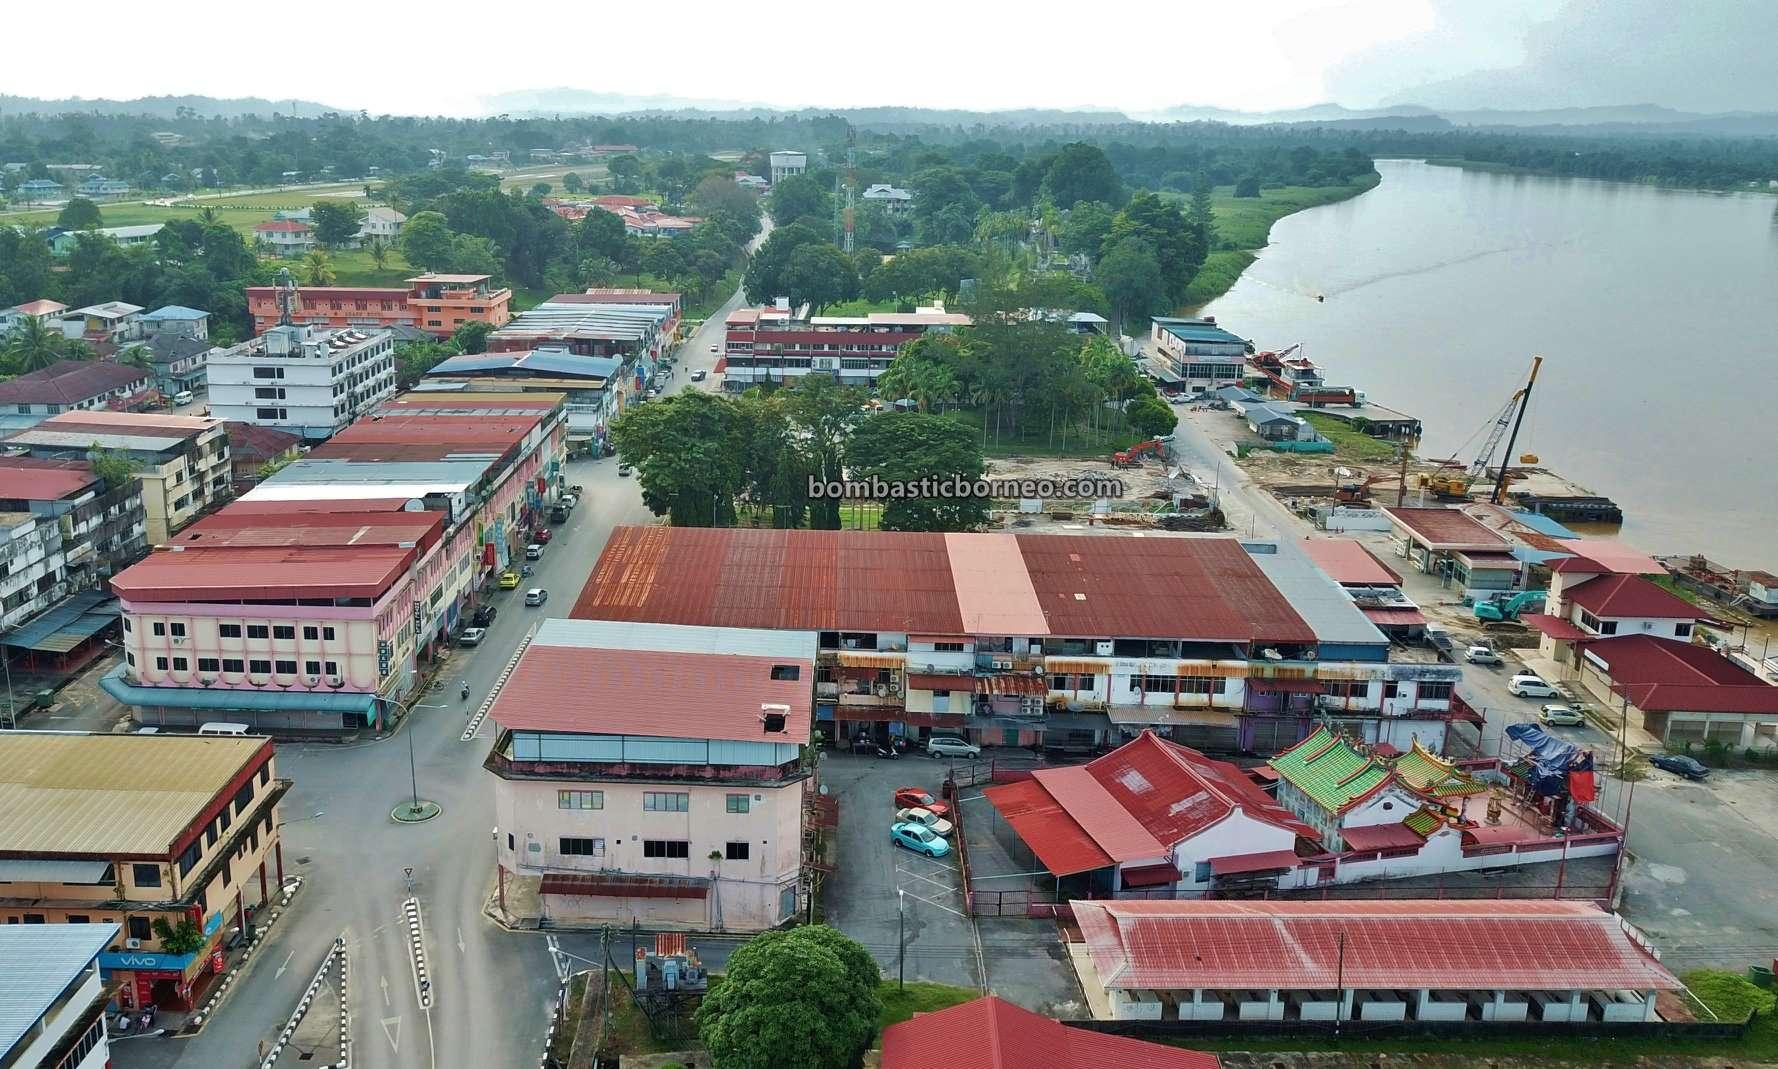 interior, backpackers, Destination, exploration, Fort Hose, museum, muzium, Miri, town, tourist attraction, travel guide, Trans Border, Borneo, 穿越婆罗洲砂拉越, 马来西亚马鲁帝